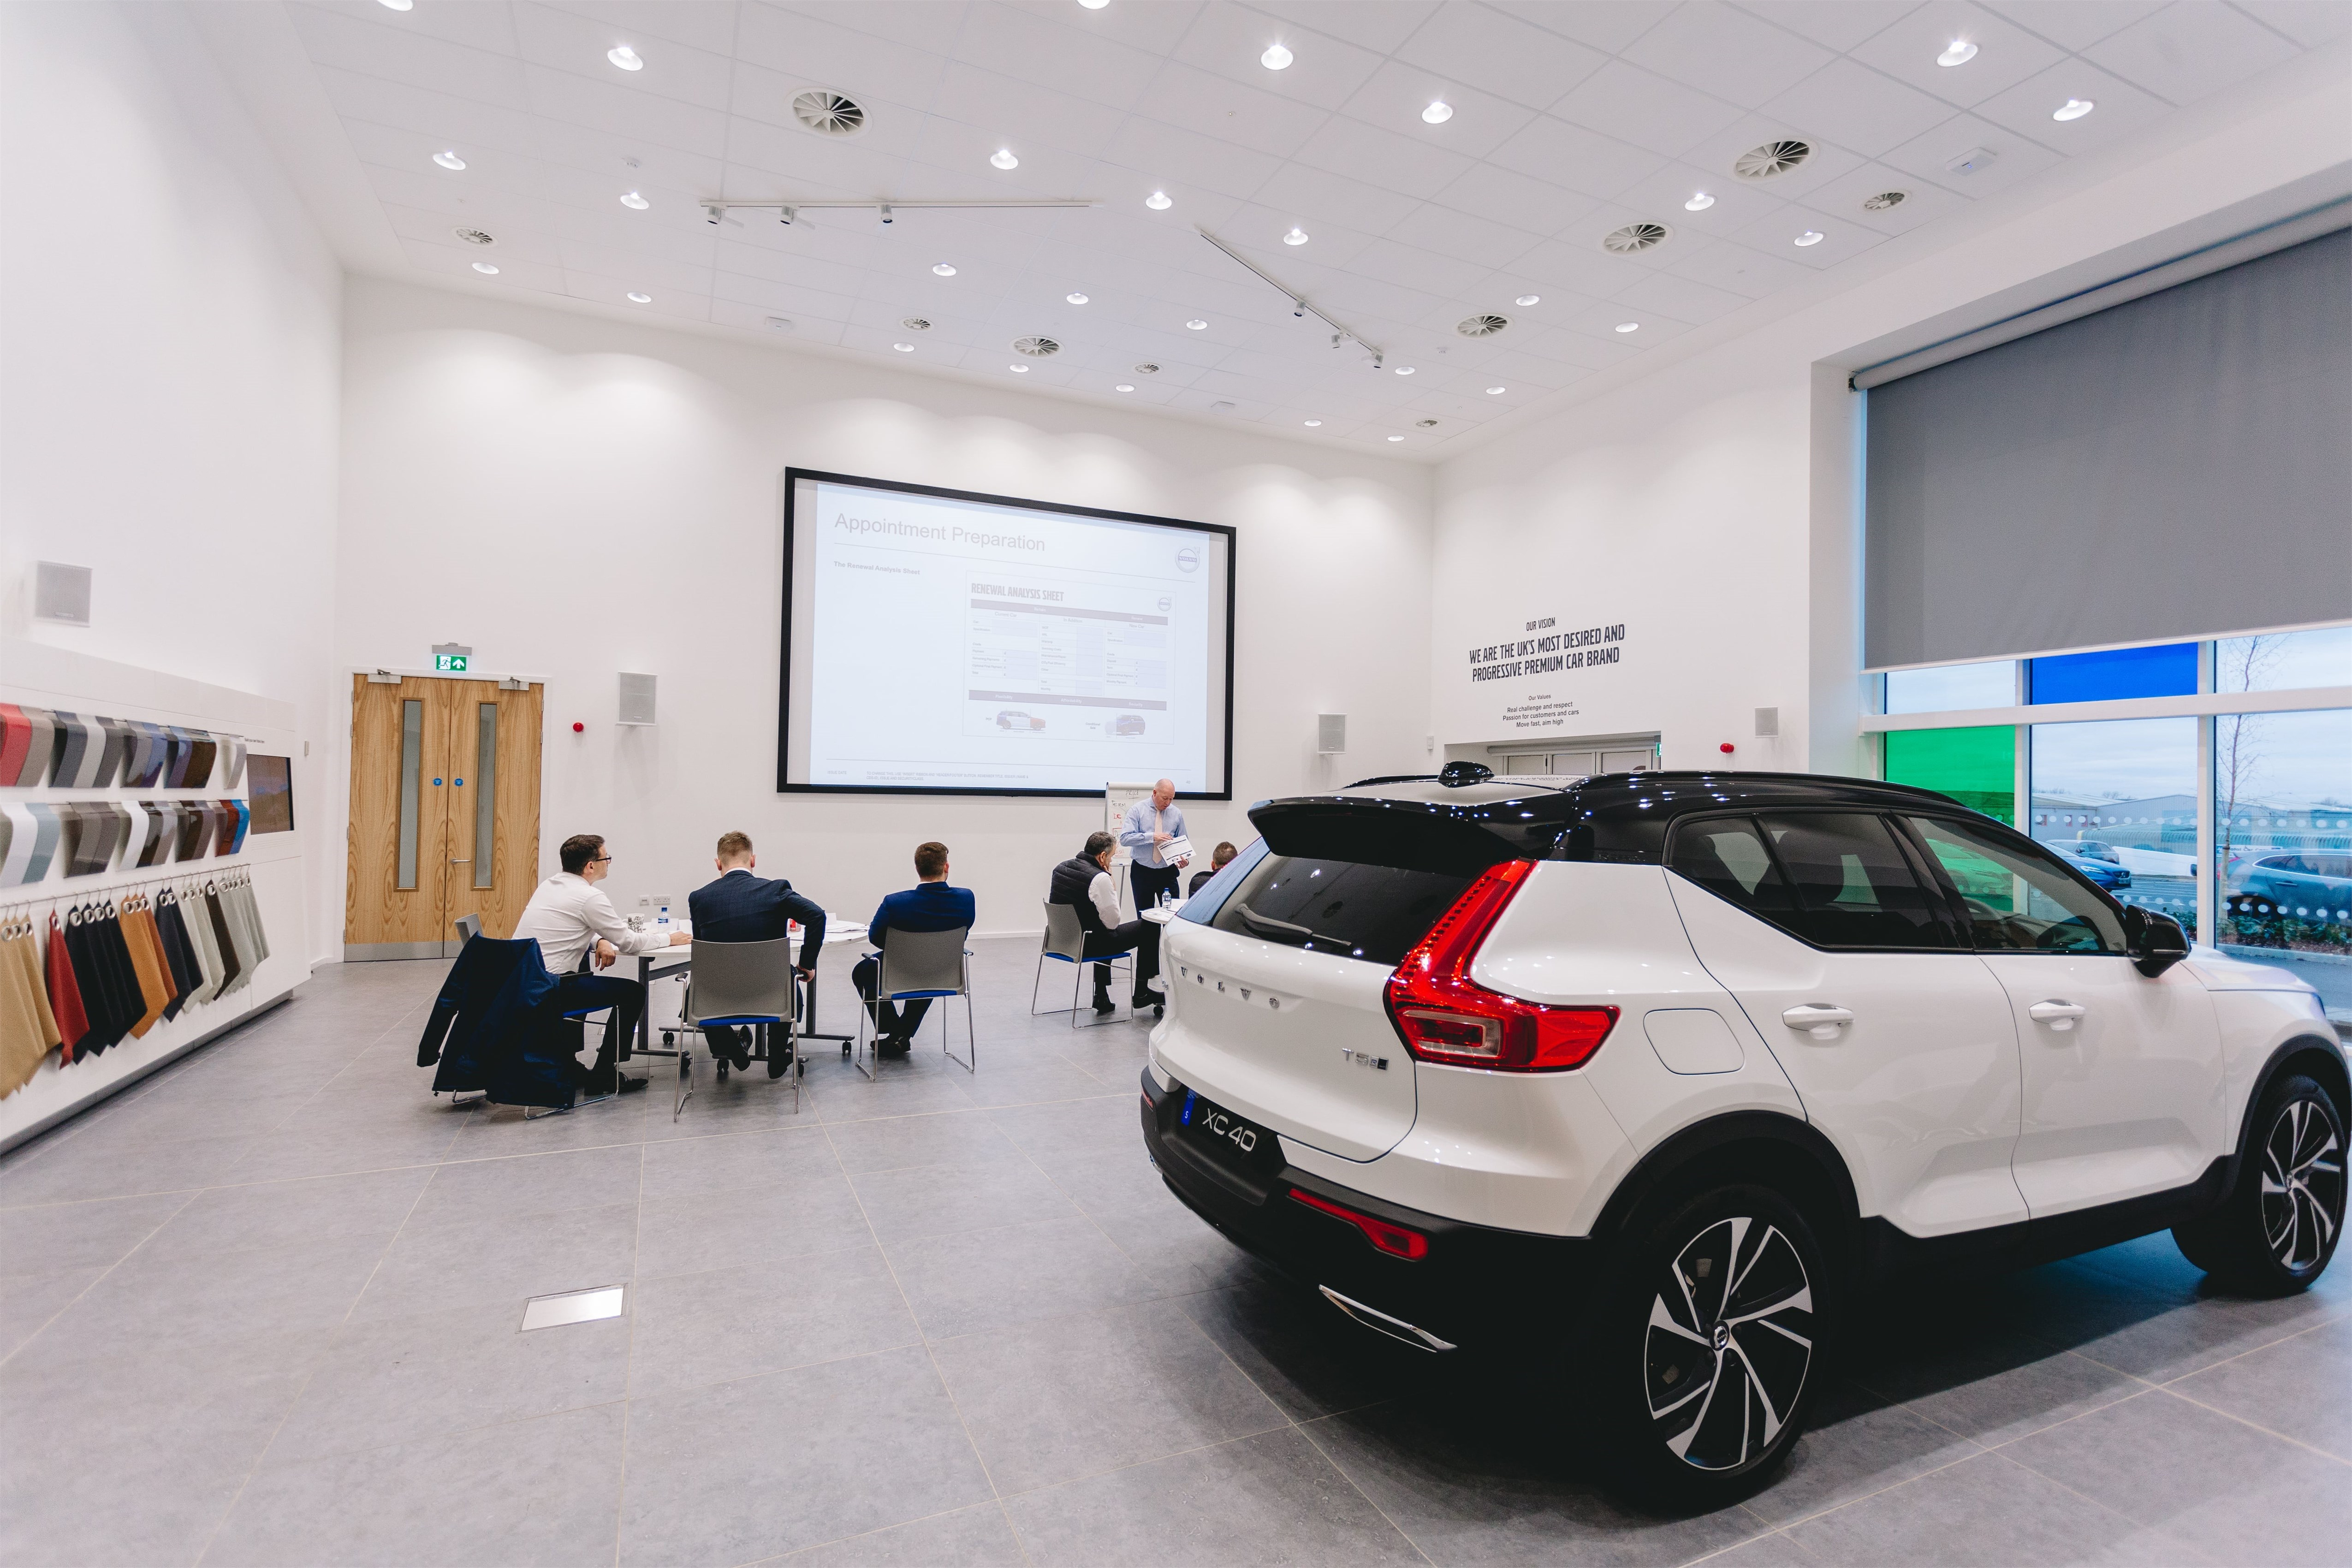 Volvo U K    Automaker Opens Customer-Centered Training Center